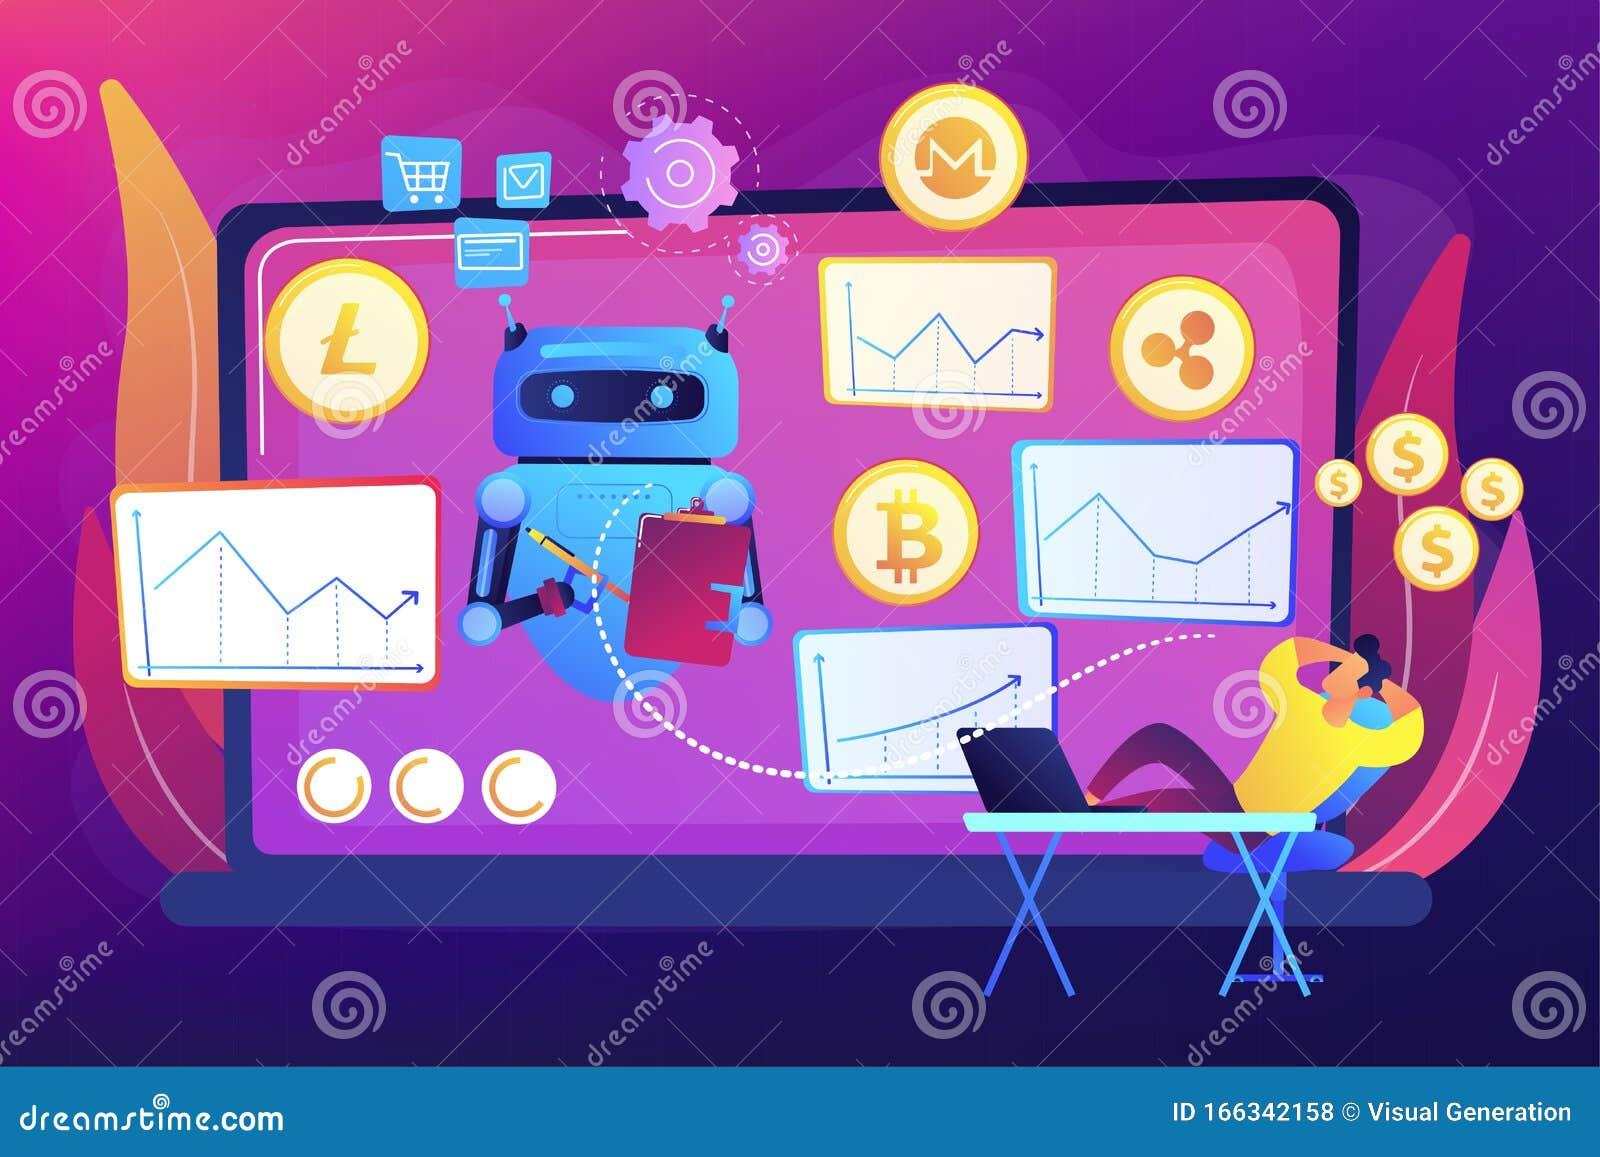 ai bitcoin trading bot